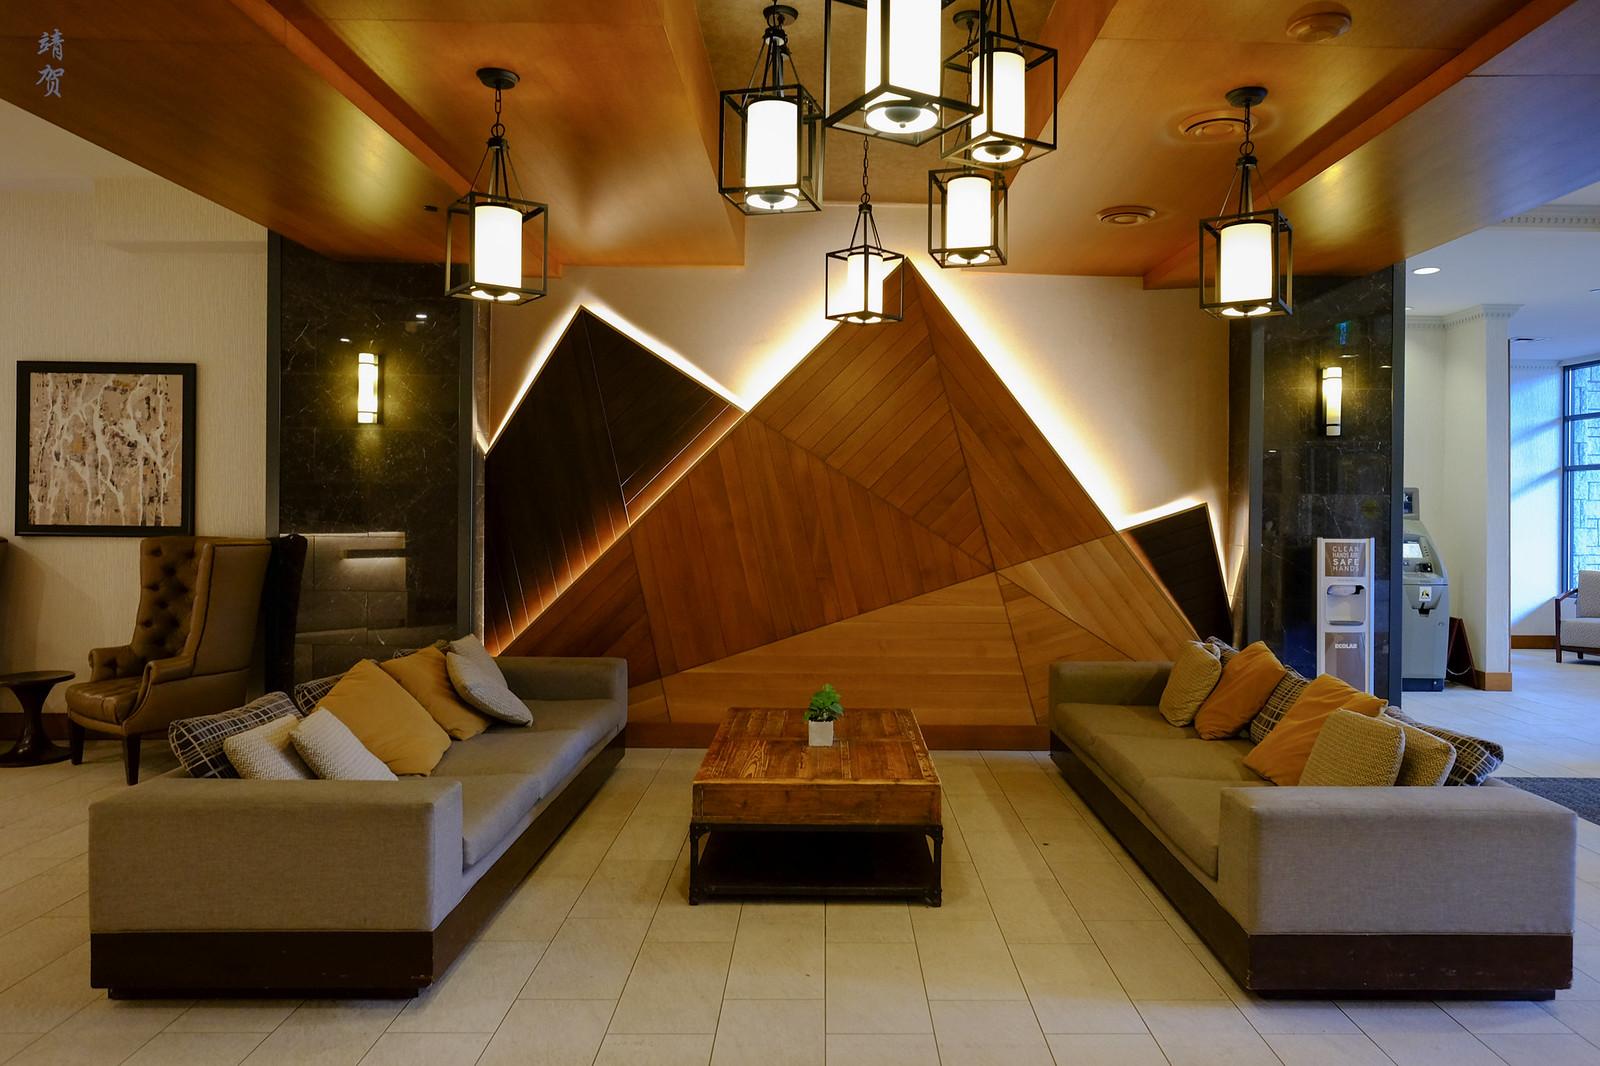 Sofa in the lobby